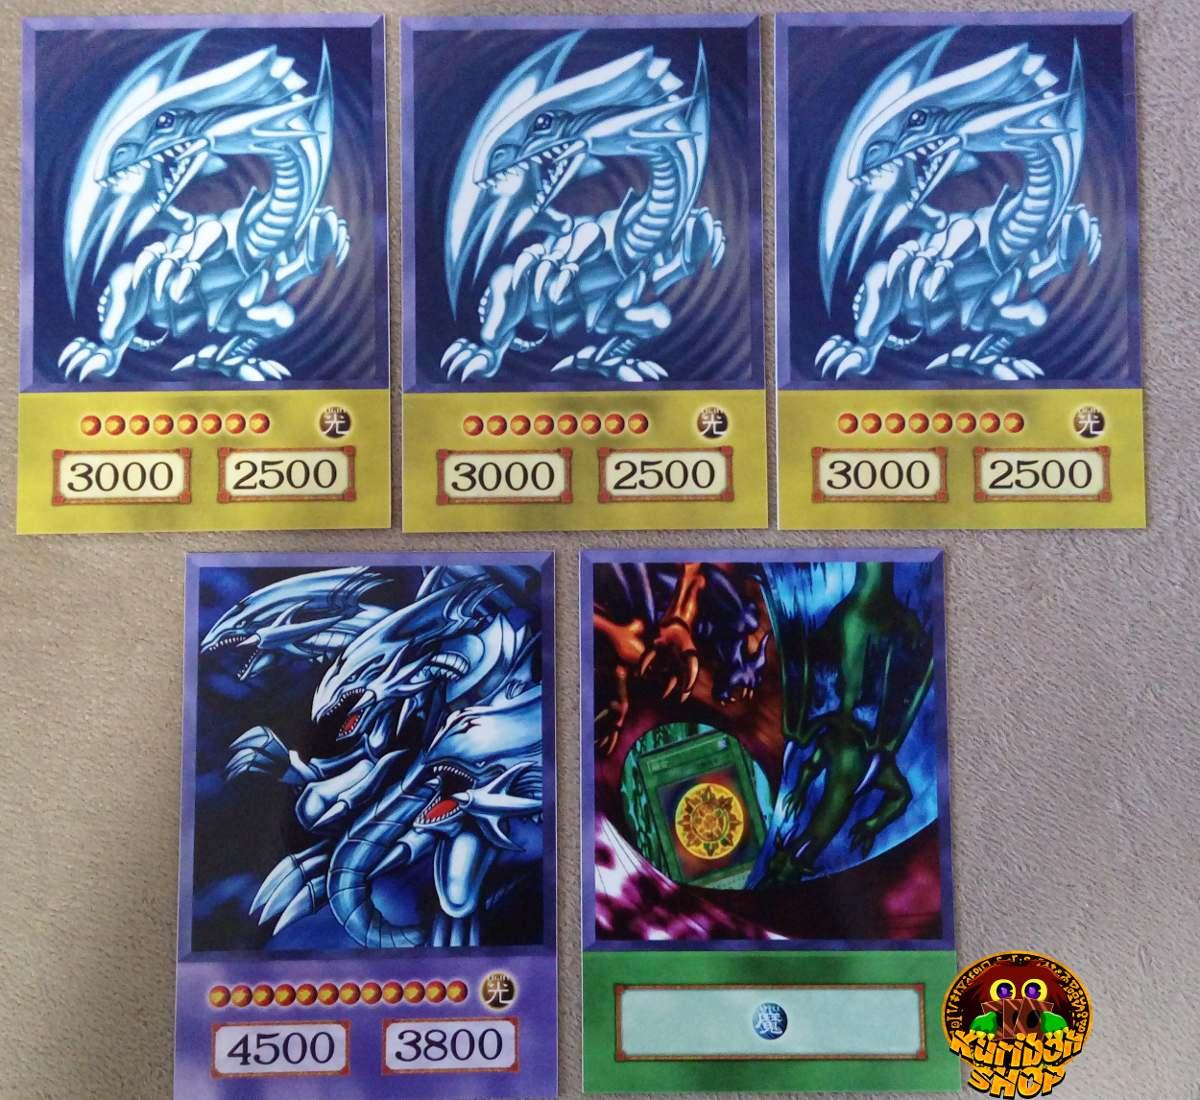 cartas yu gi oh 3 decks completos kaiba yugi pegasus r 150 00